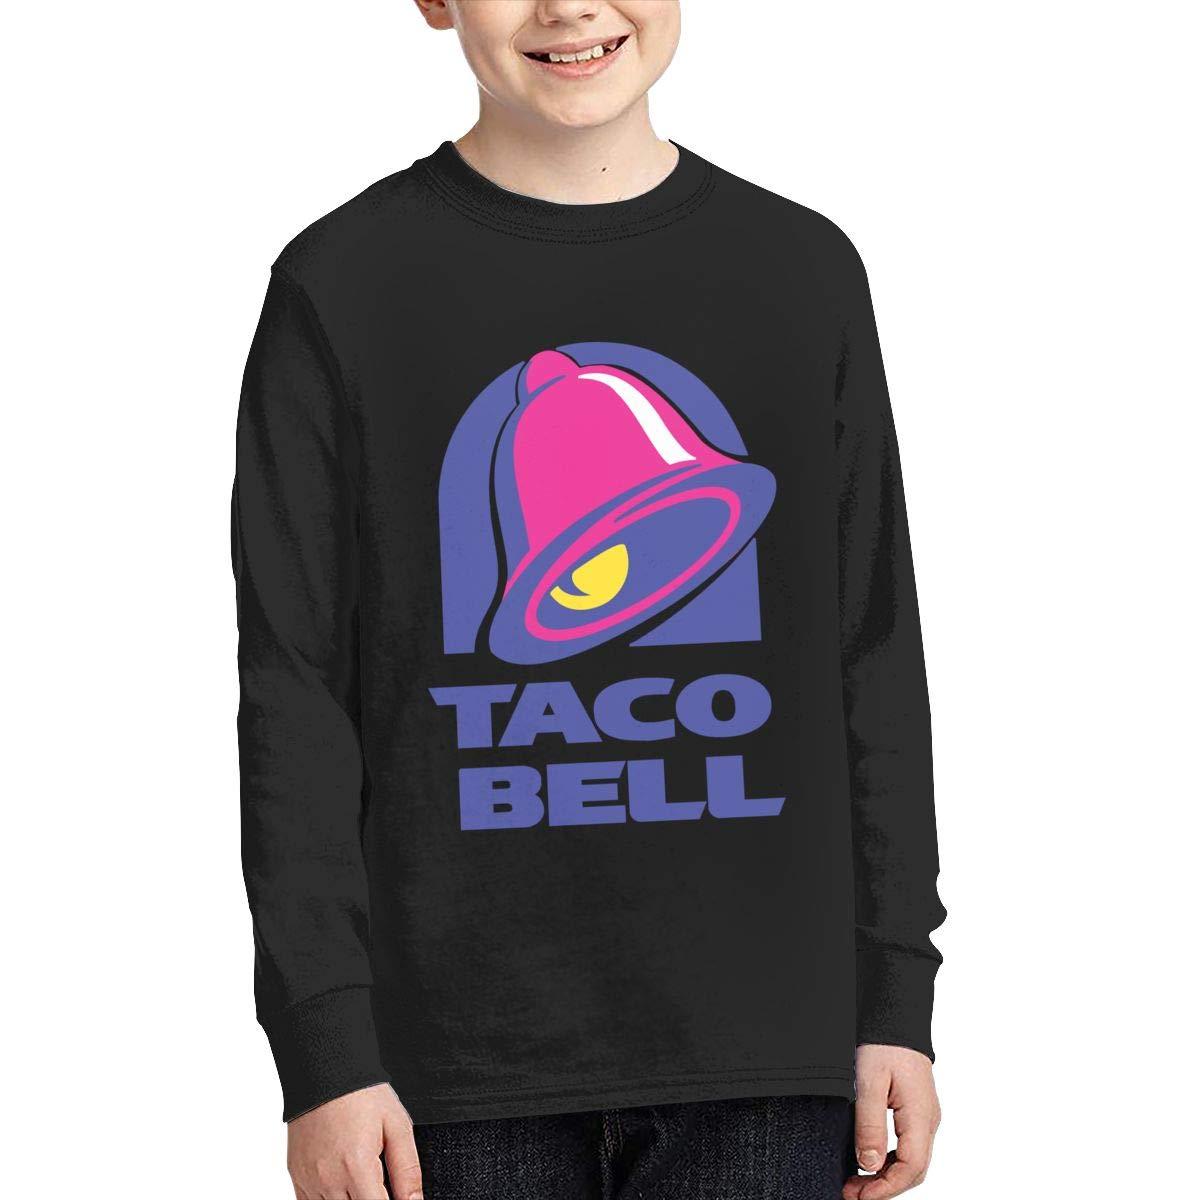 Taco Bell Logo Teen Boy Girl Workout Pullover Sweatshirt Graphic Shirt